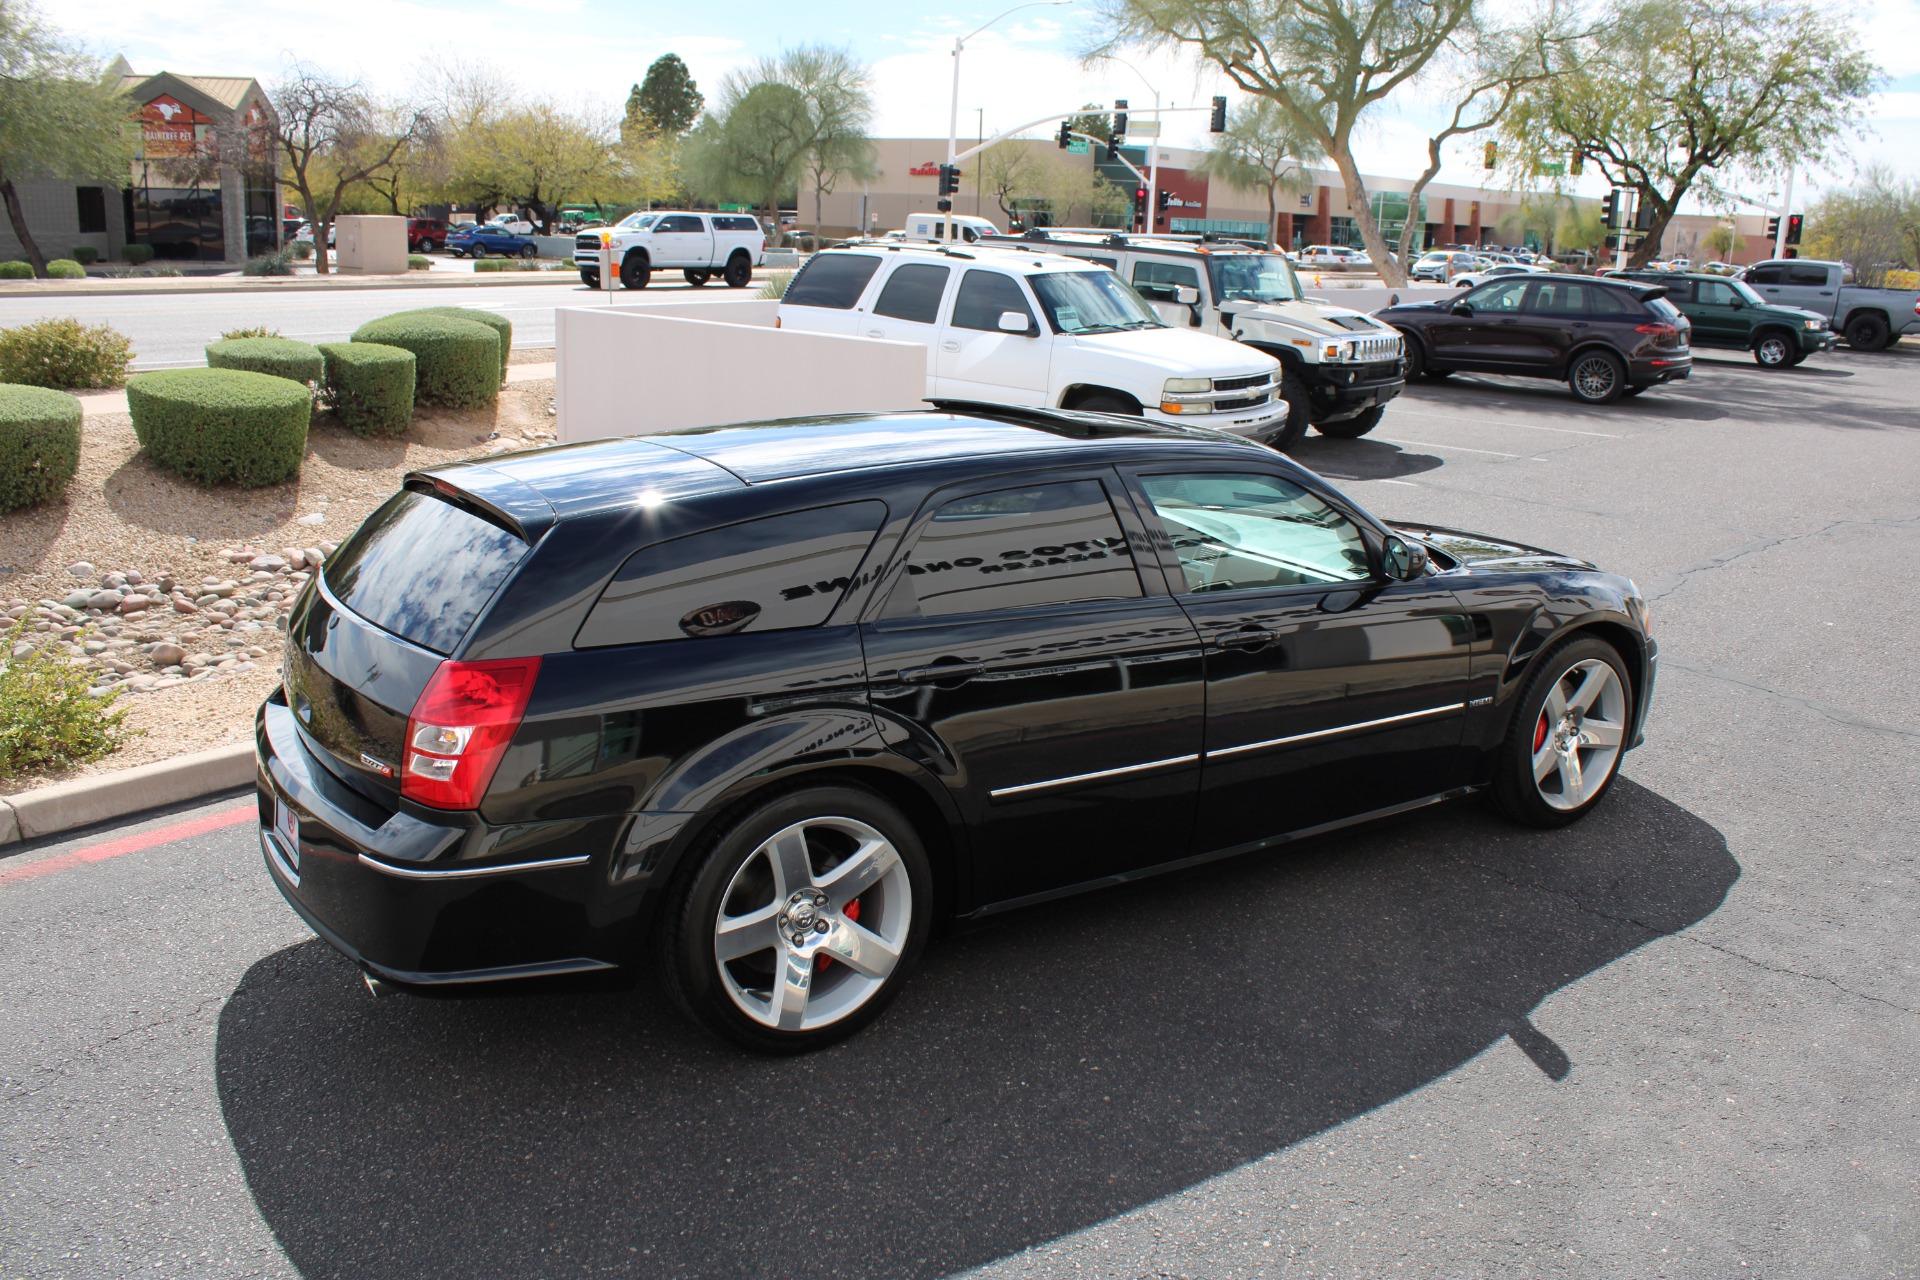 Used-2006-Dodge-Magnum-SRT8-Toyota